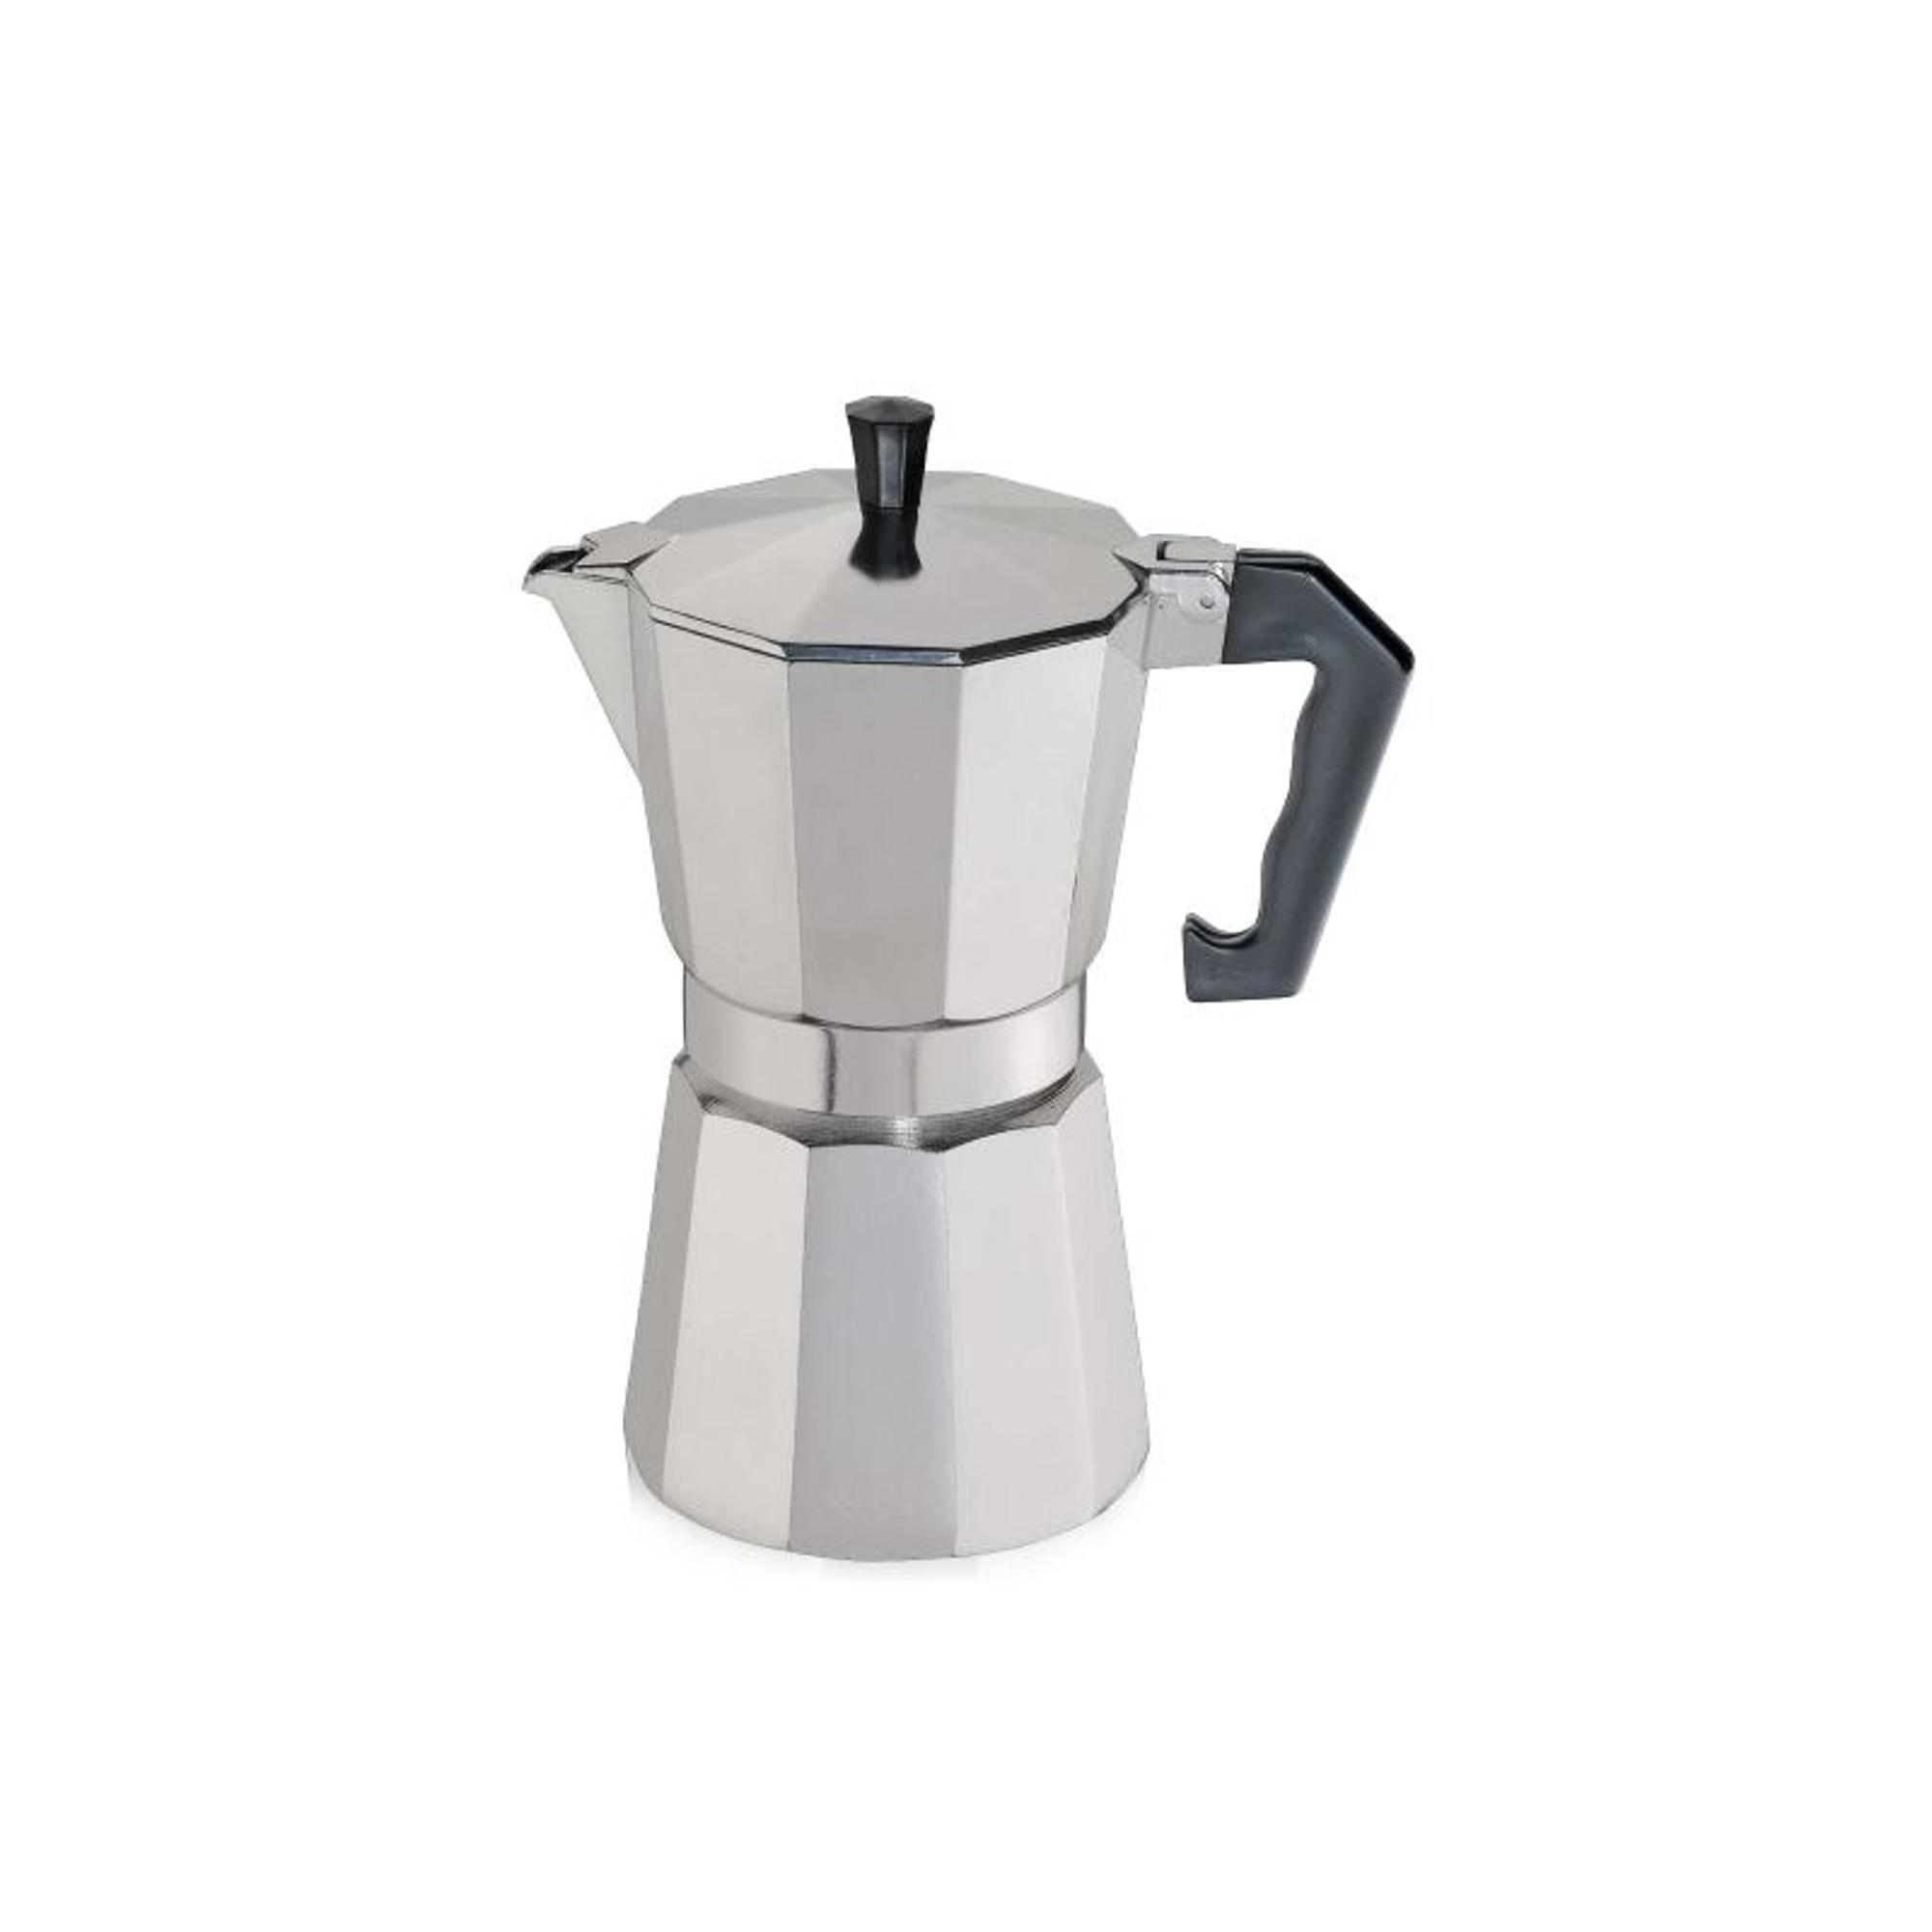 Cilio Classico Induction 6 Cup Espresso Maker with Cilio Roma White Porcelain Espresso Cup & Saucer